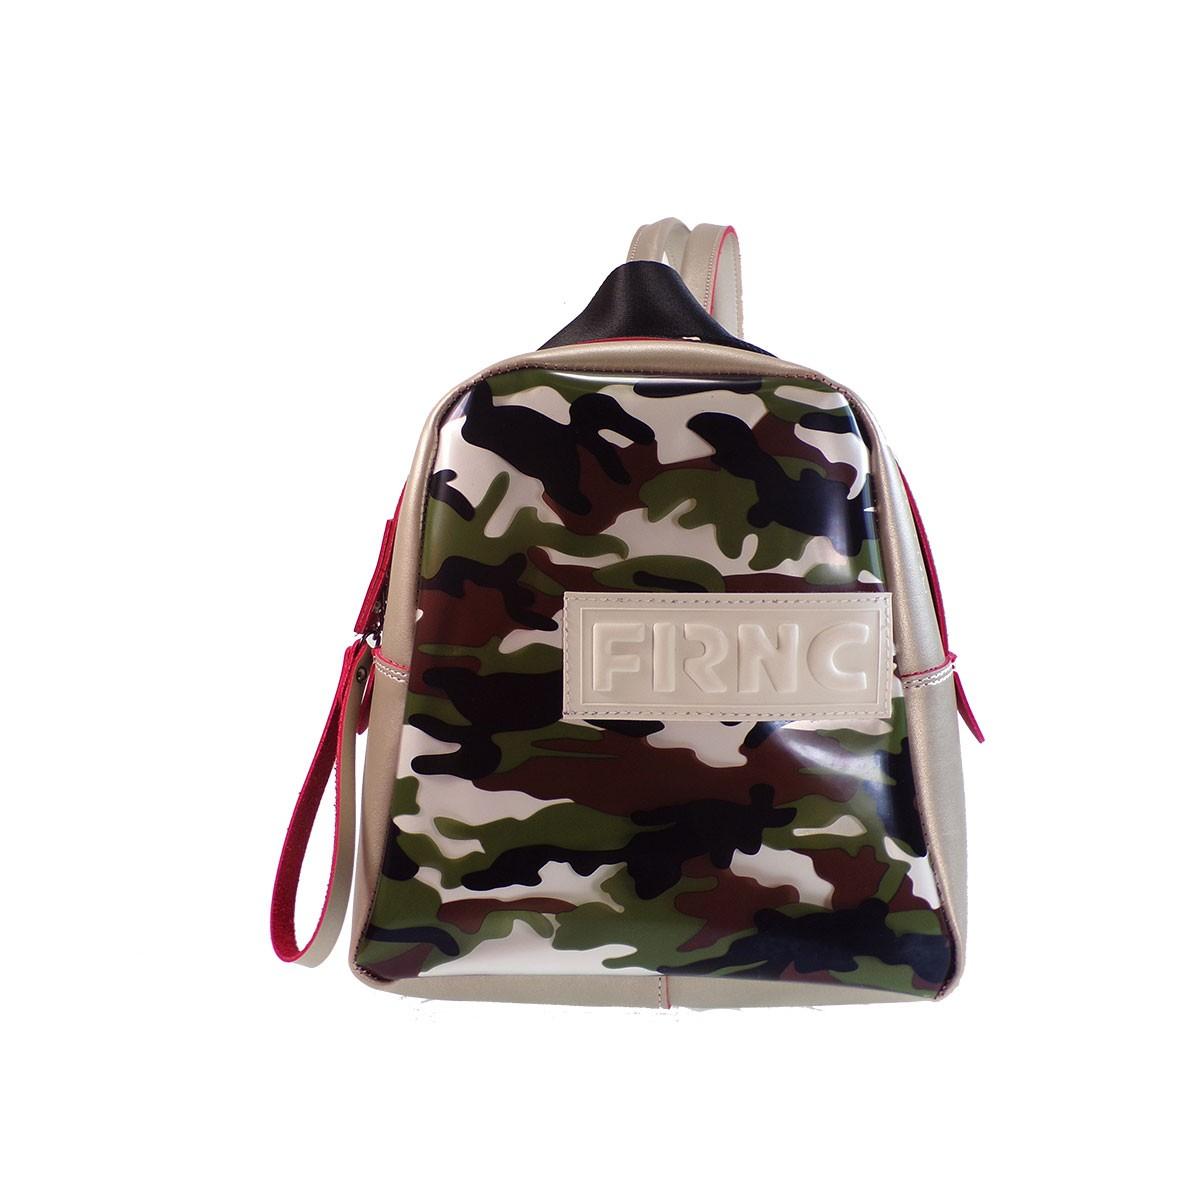 4eafabf10f FRNC FRANCESCO Τσάντα Γυναικεία Πλάτης-Backpack 2201 Πλατίνα ...